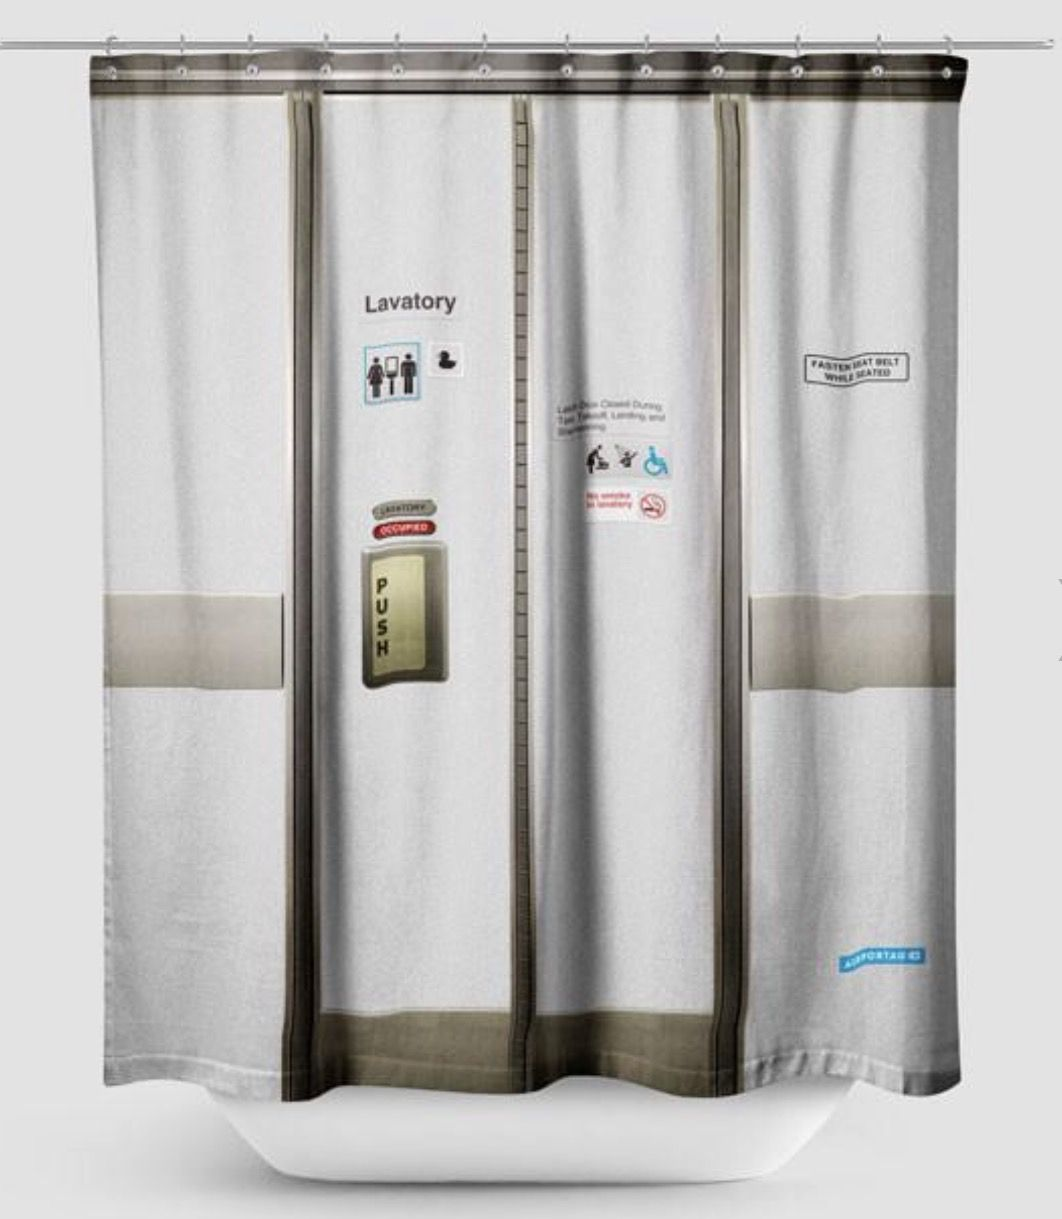 Aircraft Lav Door Shower Curtain Too Funny Shower Curtain Travel Bathroom Curtains